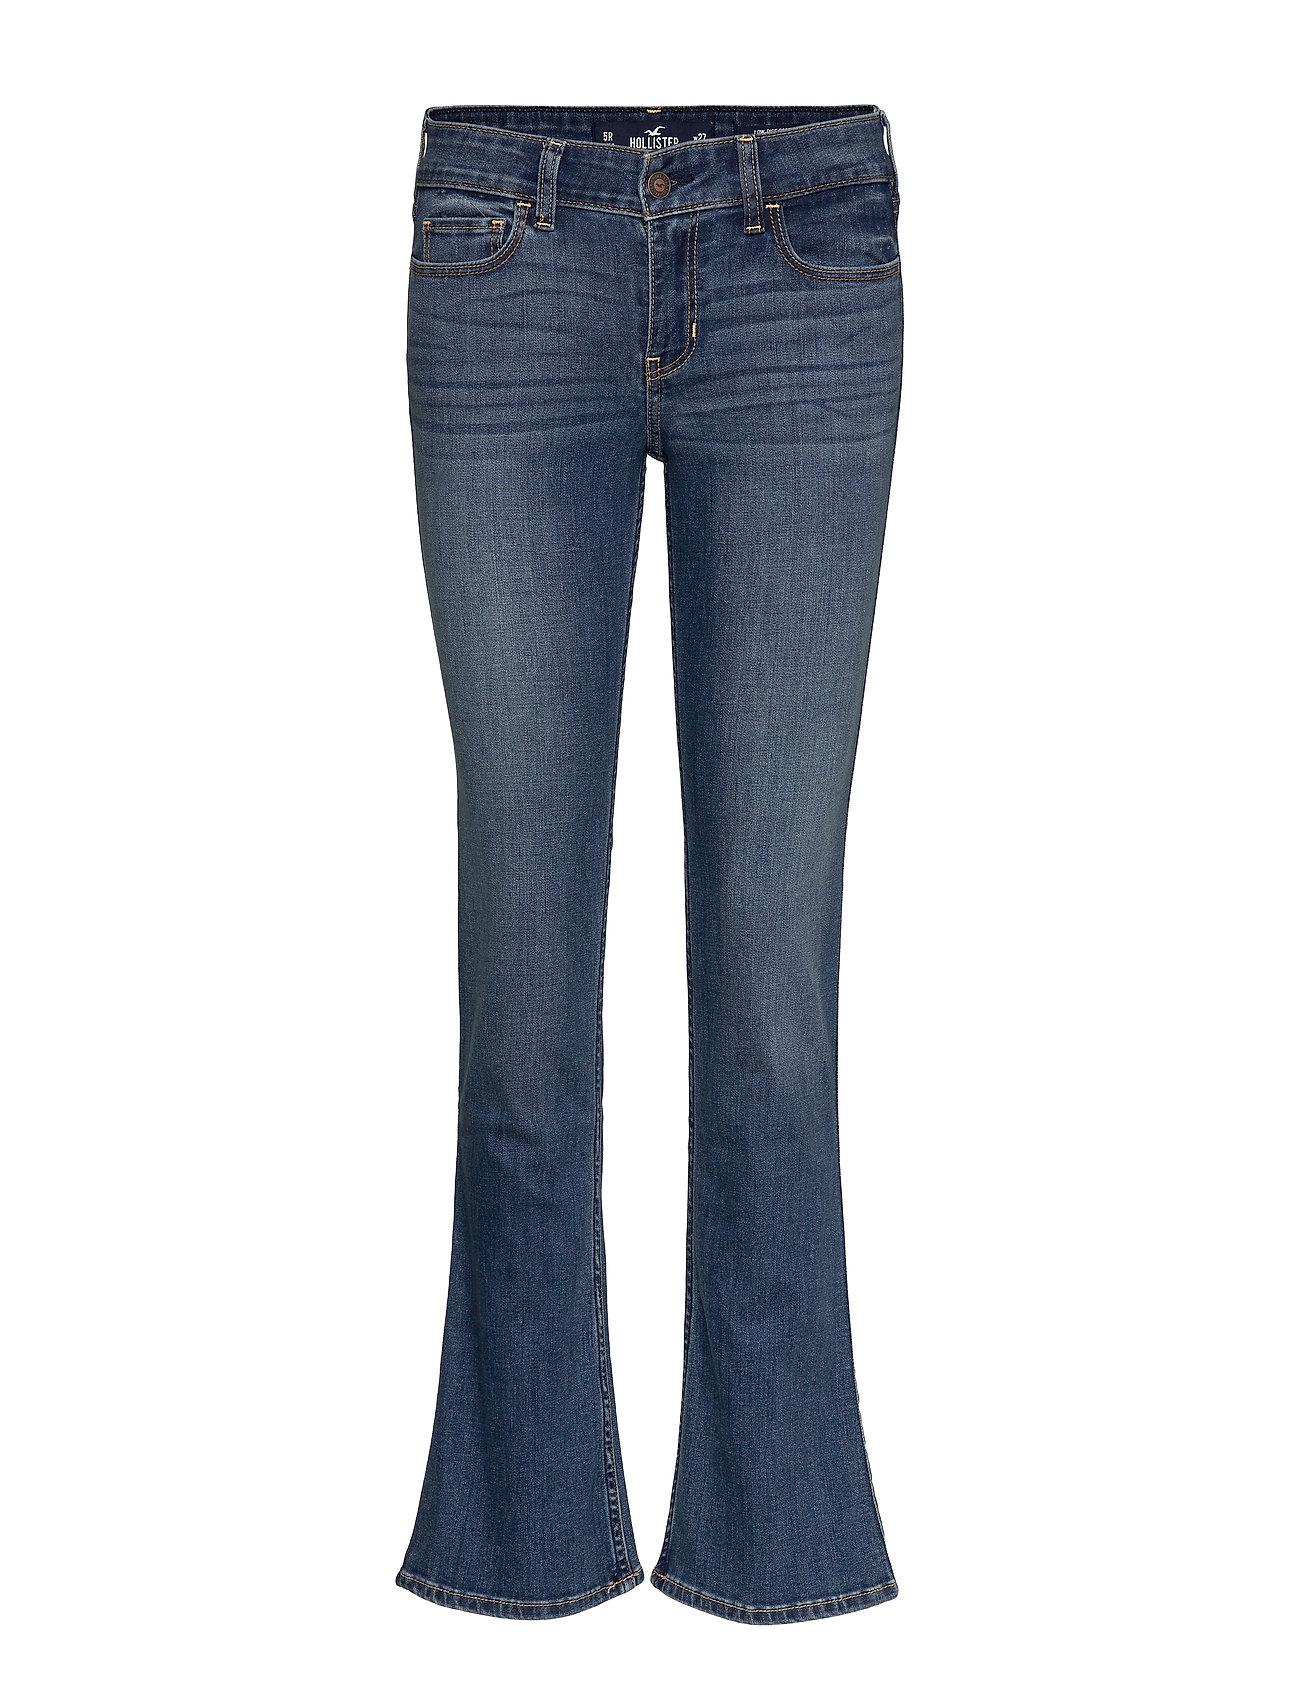 Hollister Medium Lr Boot Jeans - TURQ/BLUE PATTERN